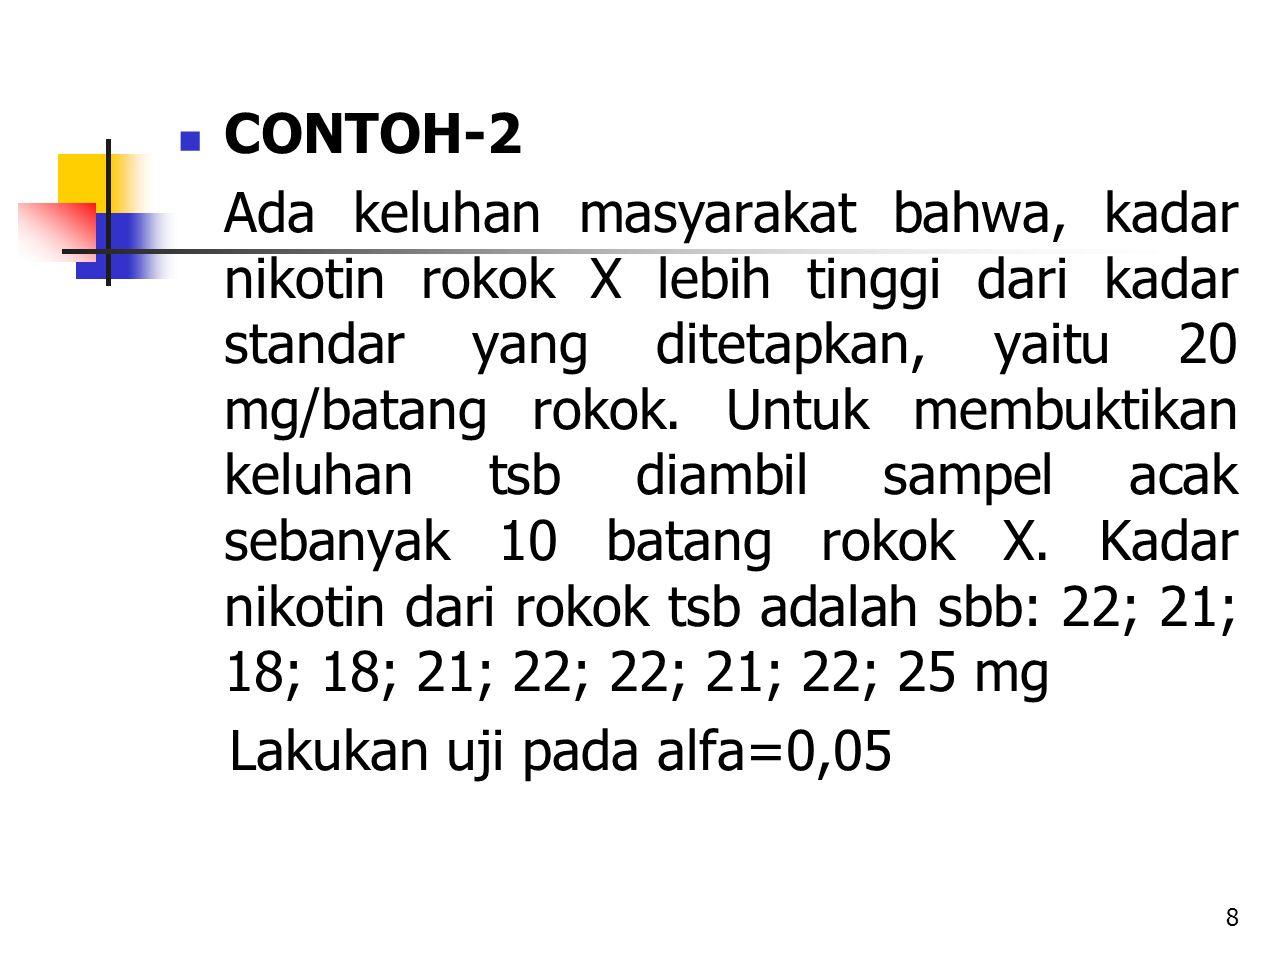 CONTOH-2 Ada keluhan masyarakat bahwa, kadar nikotin rokok X lebih tinggi dari kadar standar yang ditetapkan, yaitu 20 mg/batang rokok. Untuk membukti